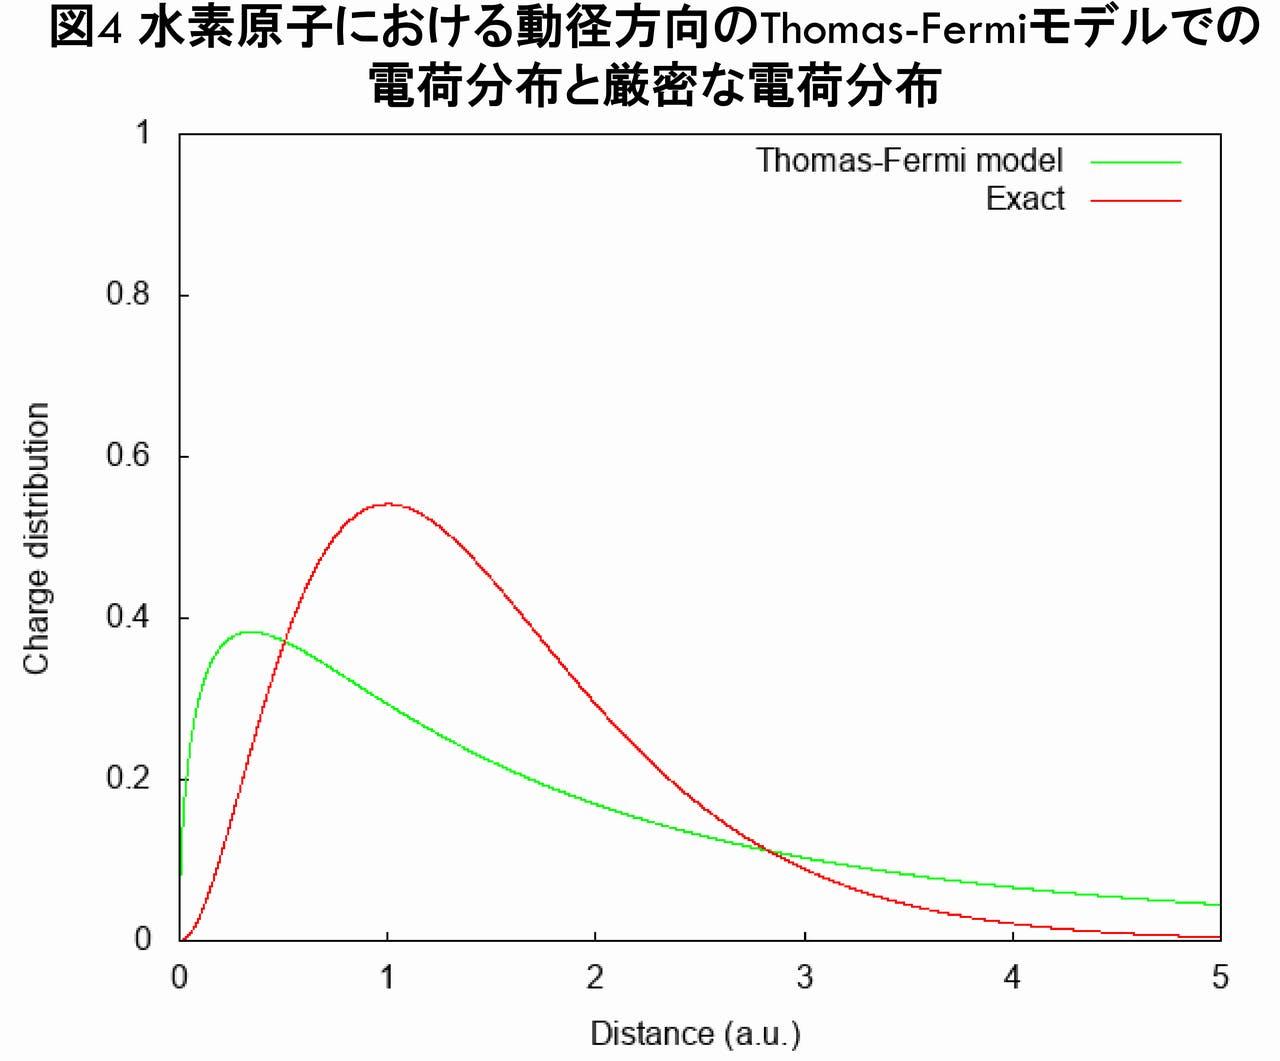 rho_distribution.png